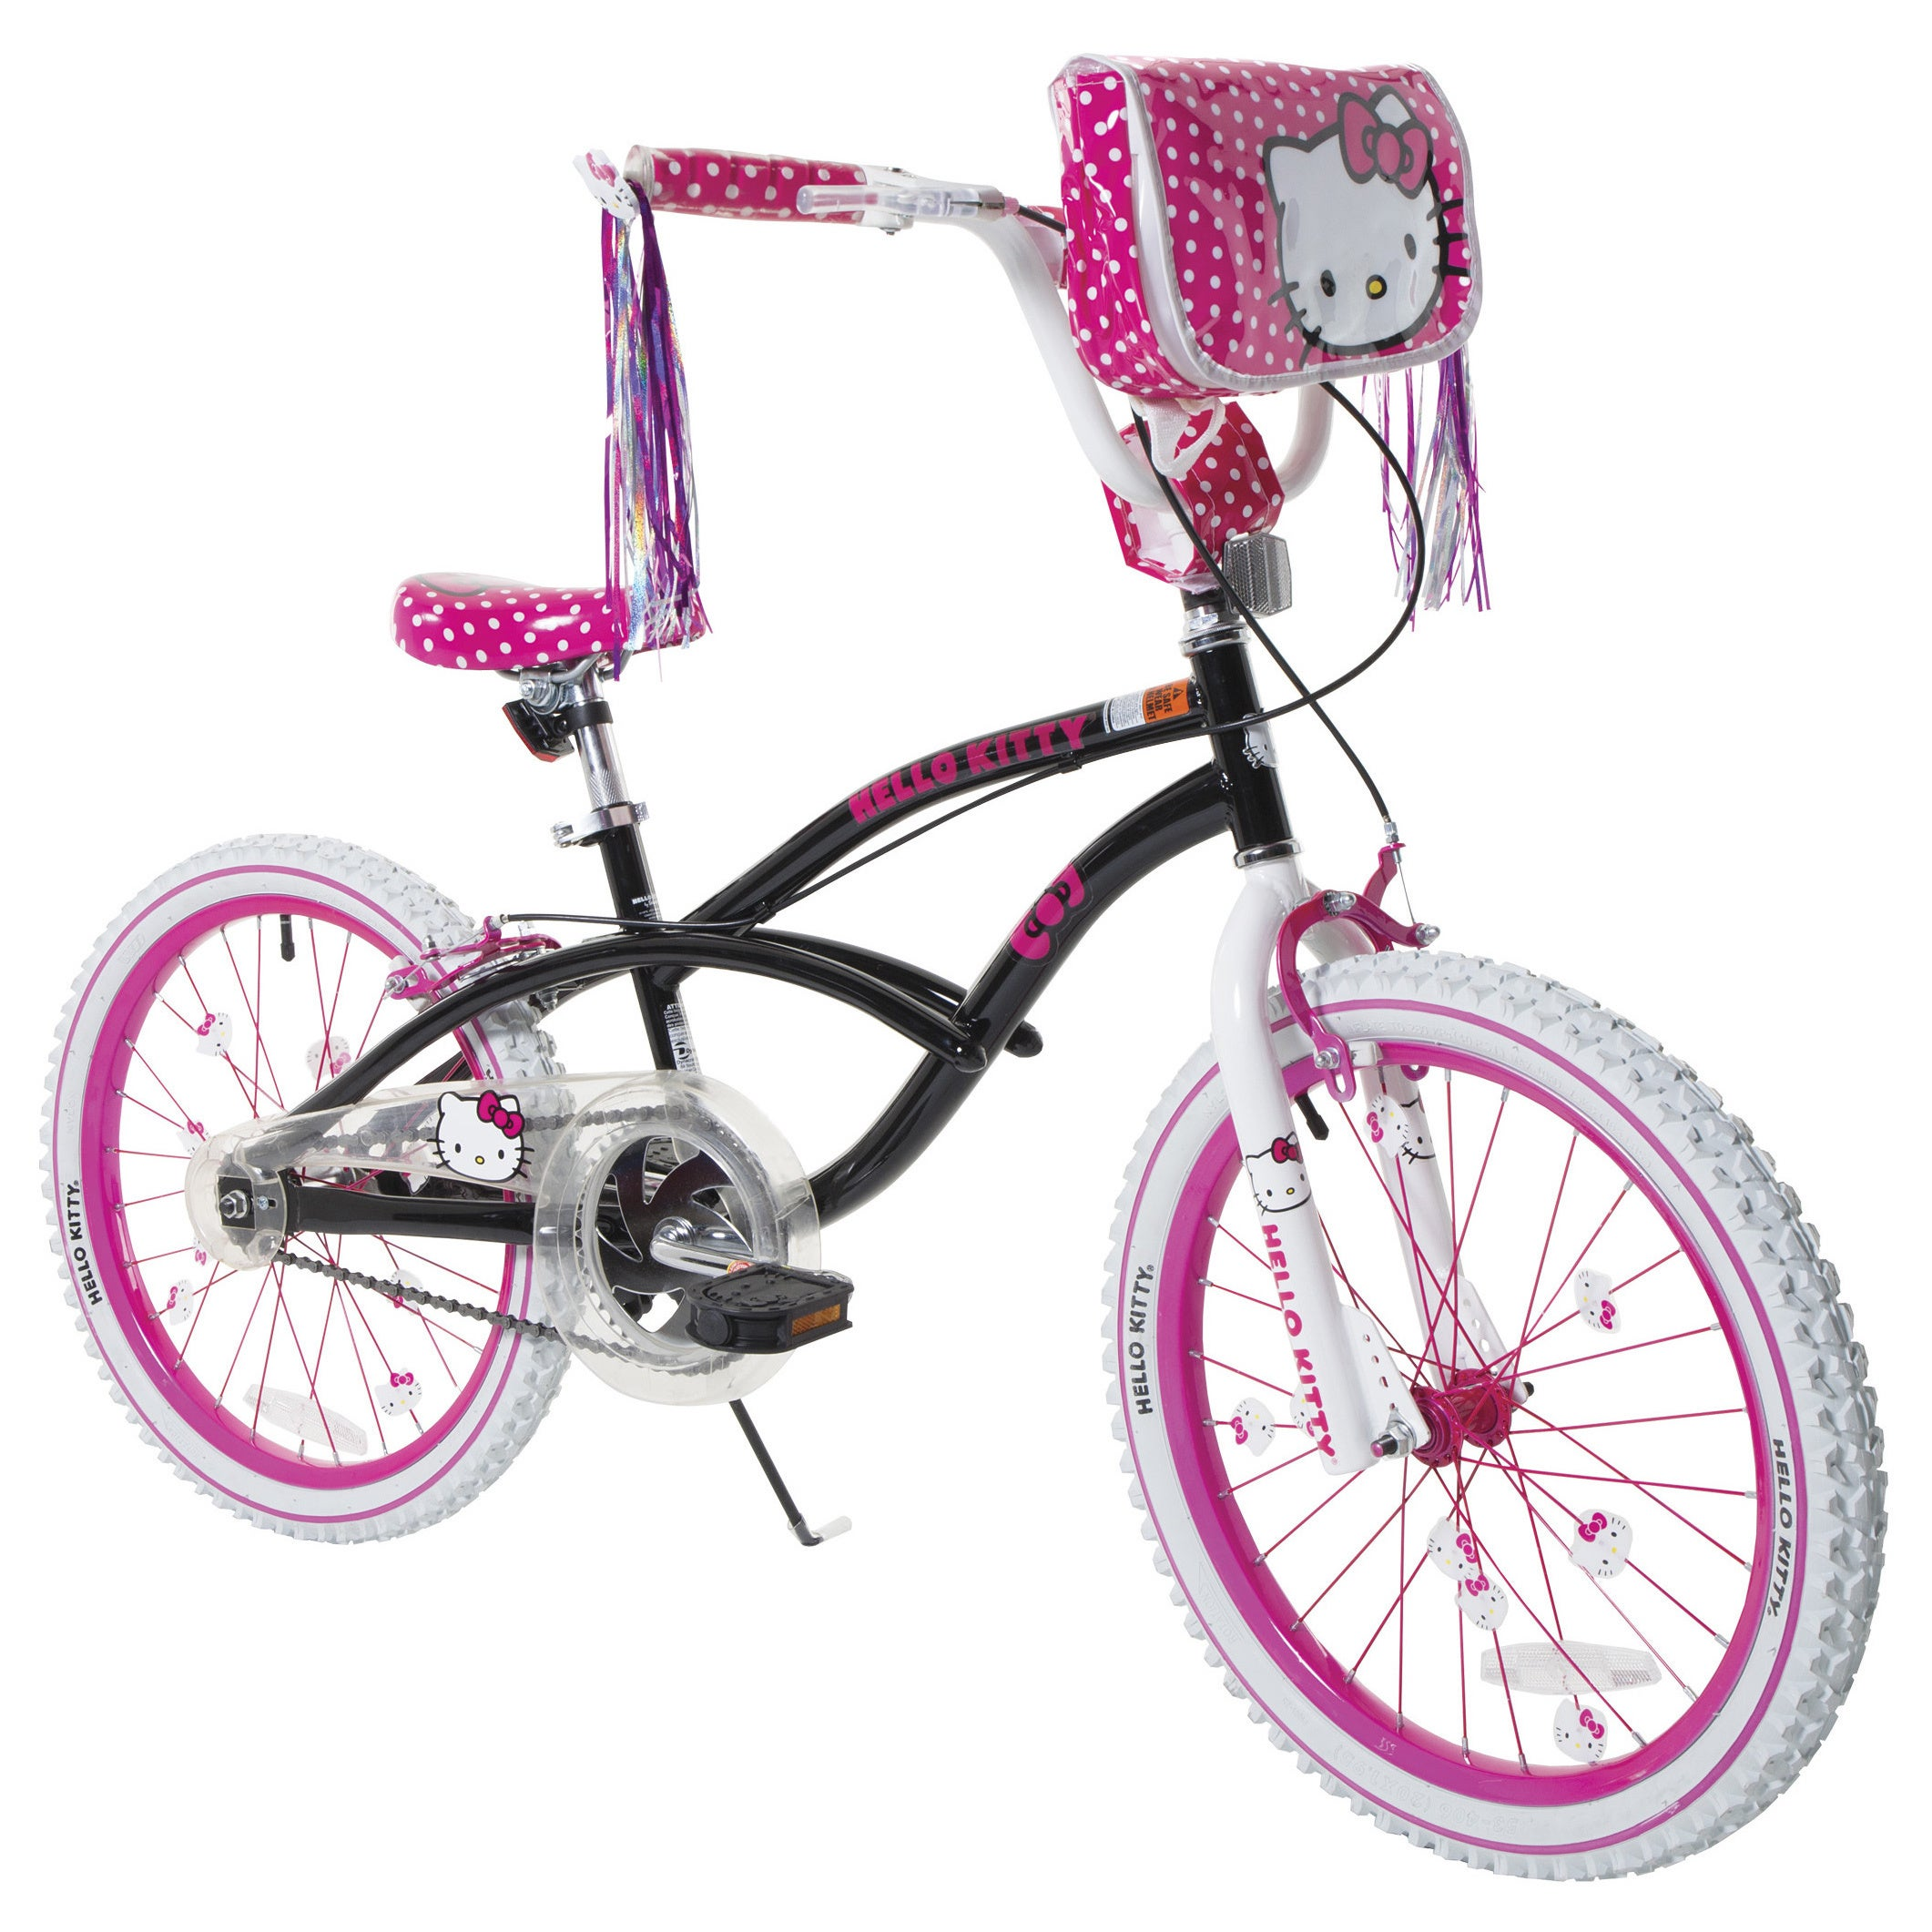 LTD Hello Kitty 20-inch BMX Bike (20'' Hot Pink, Black)